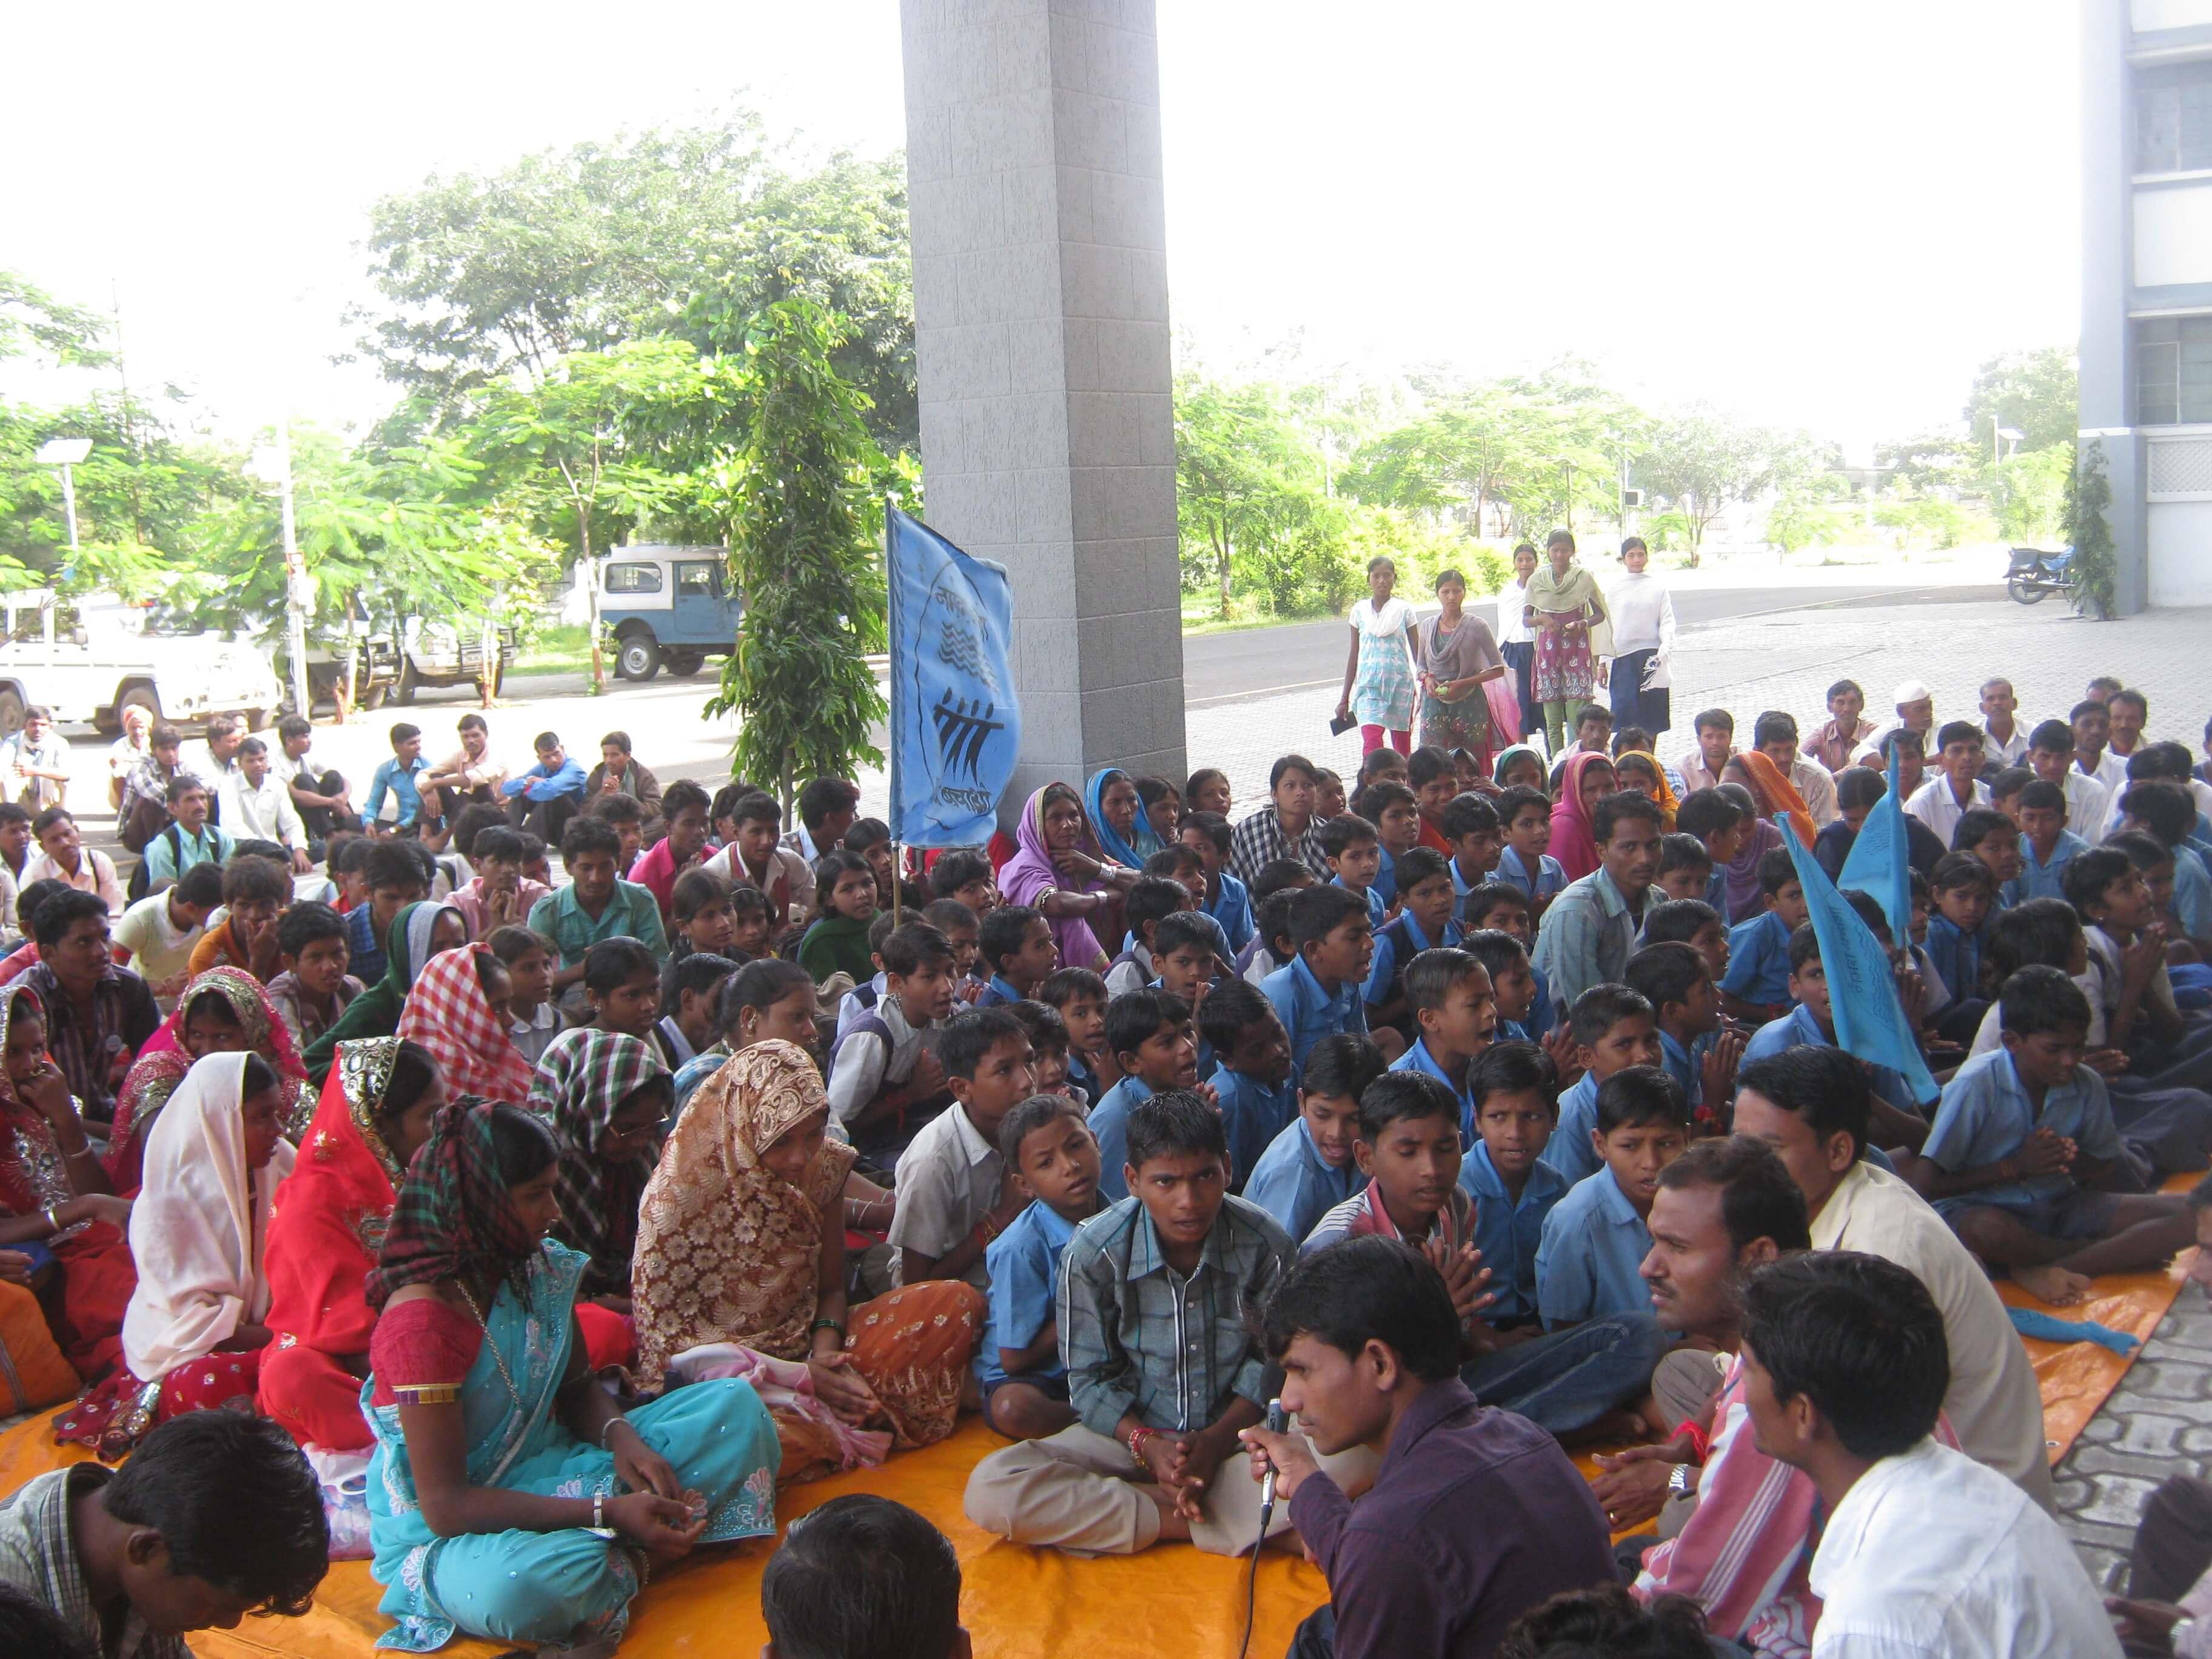 Sardar Sarovar Rehabilitation in Maharashtra: Adivasi Rights  Peaceful protest by 1200 adivasis: Police excesses condemnable